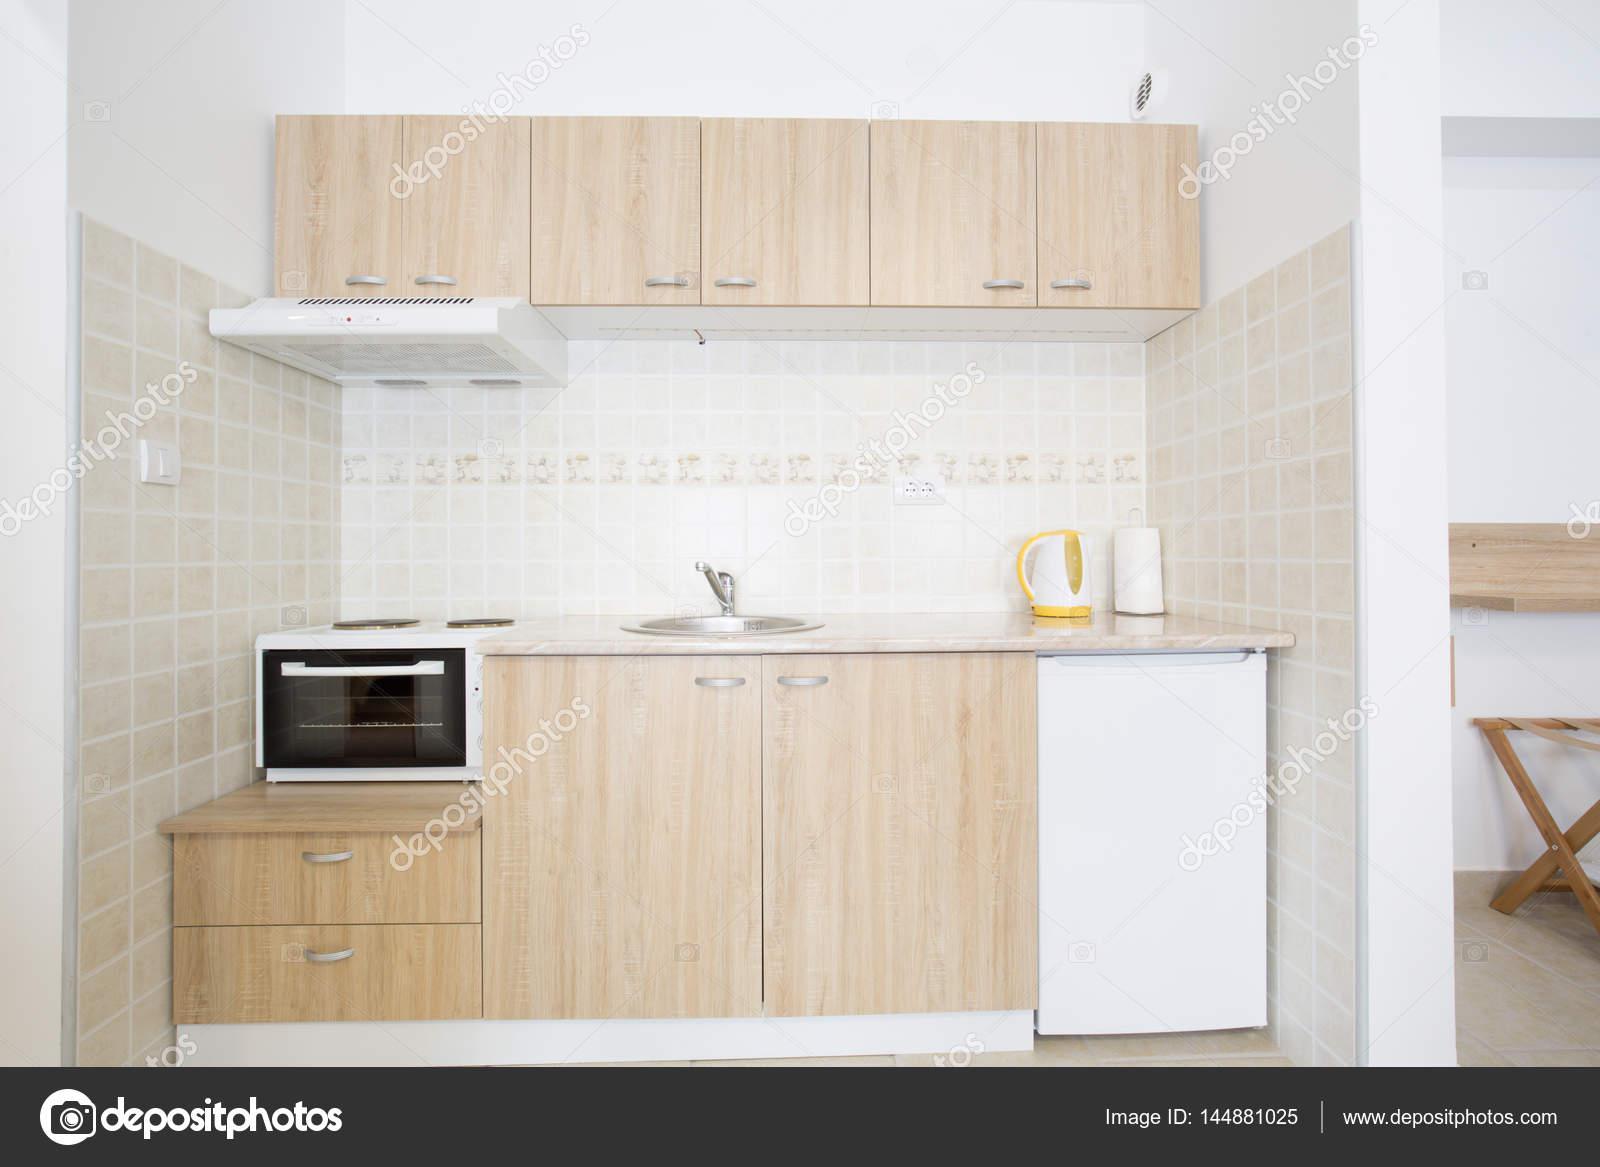 Design Kleine Keuken : Kleine keuken interieur design u2014 stockfoto © rilueda #144881025